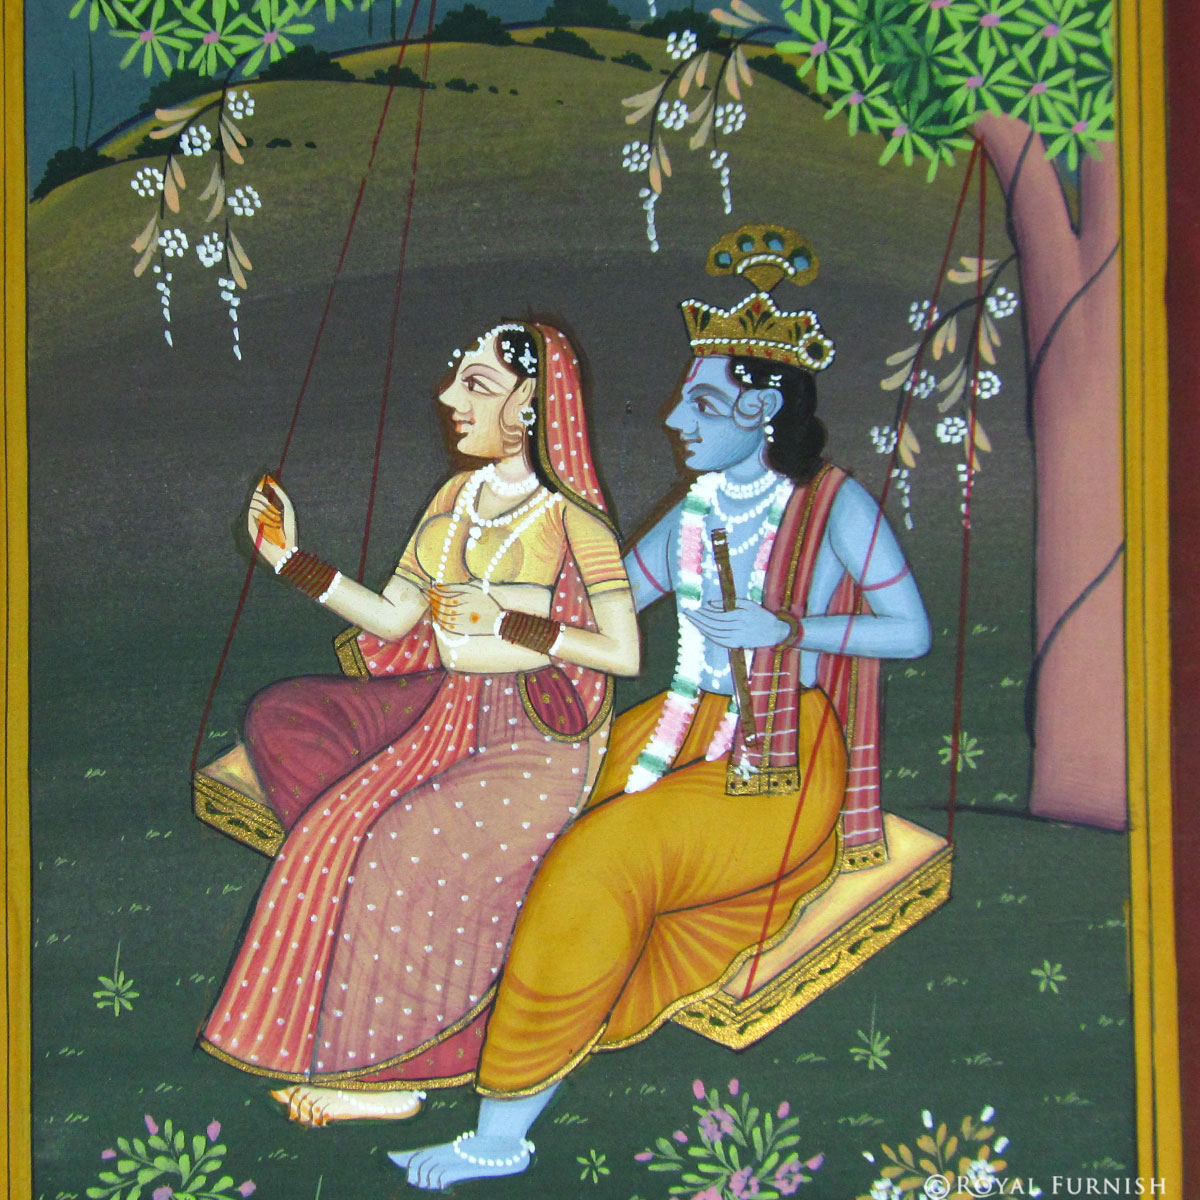 Hindustani Girl Wallpaper Hindu Radha Krishna On Swing Rajasthani Miniature Wall Art